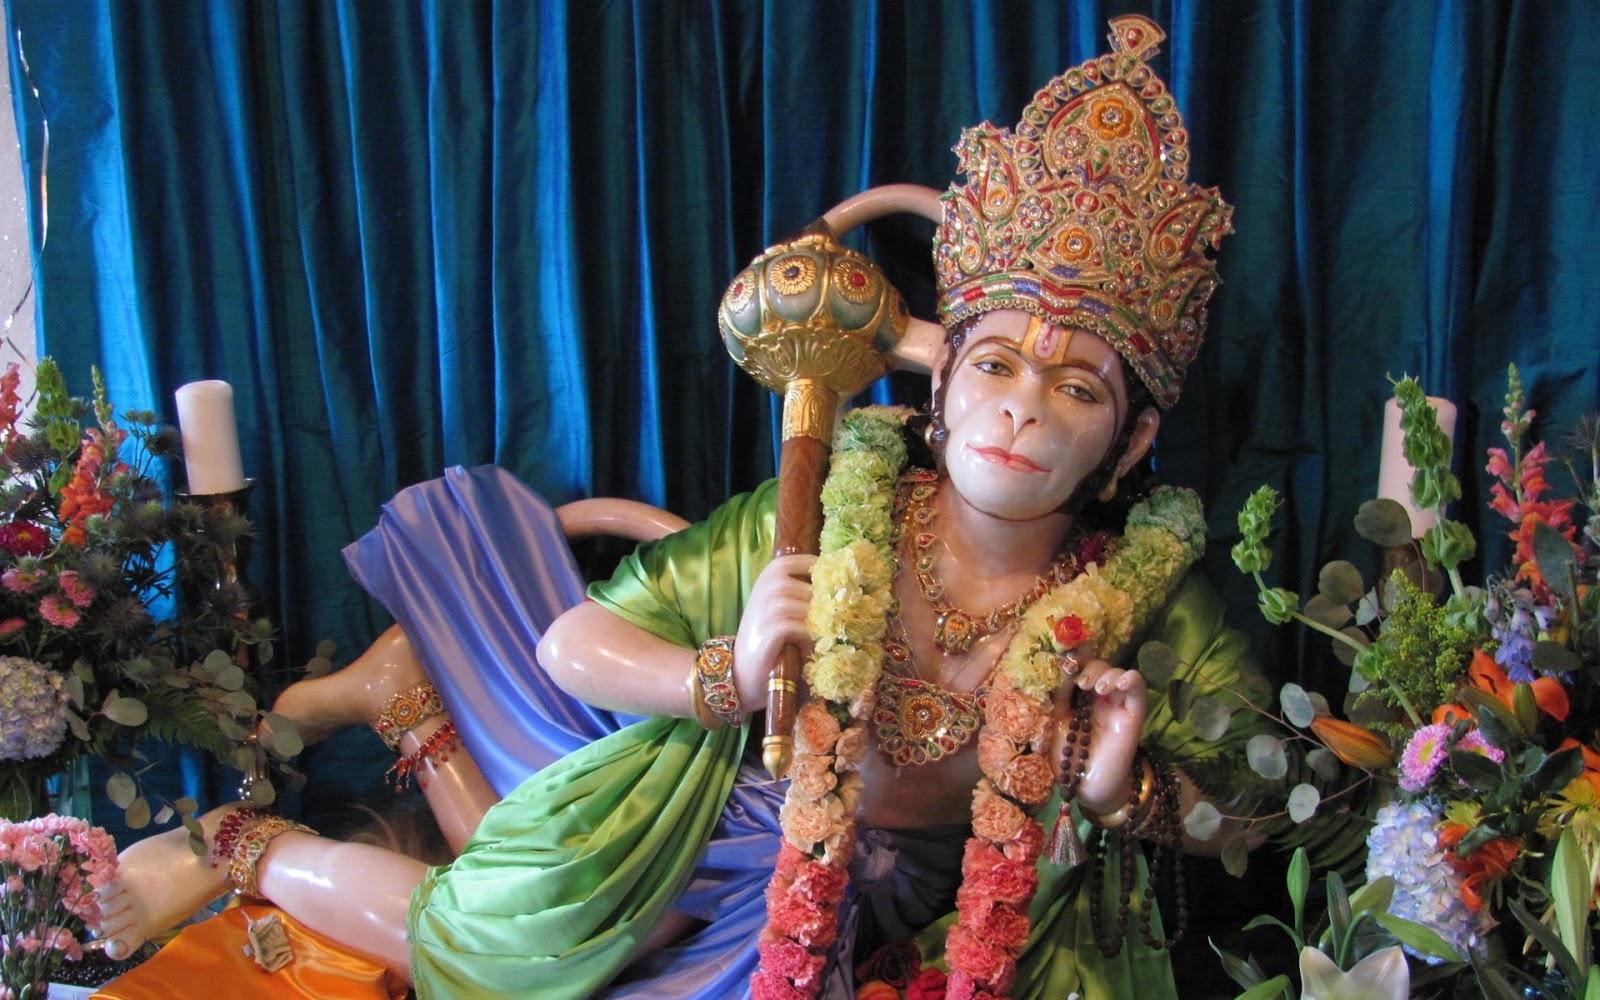 Hd Wallpapers Free God Lord Ganesha Vishwakarma God Lord Radha